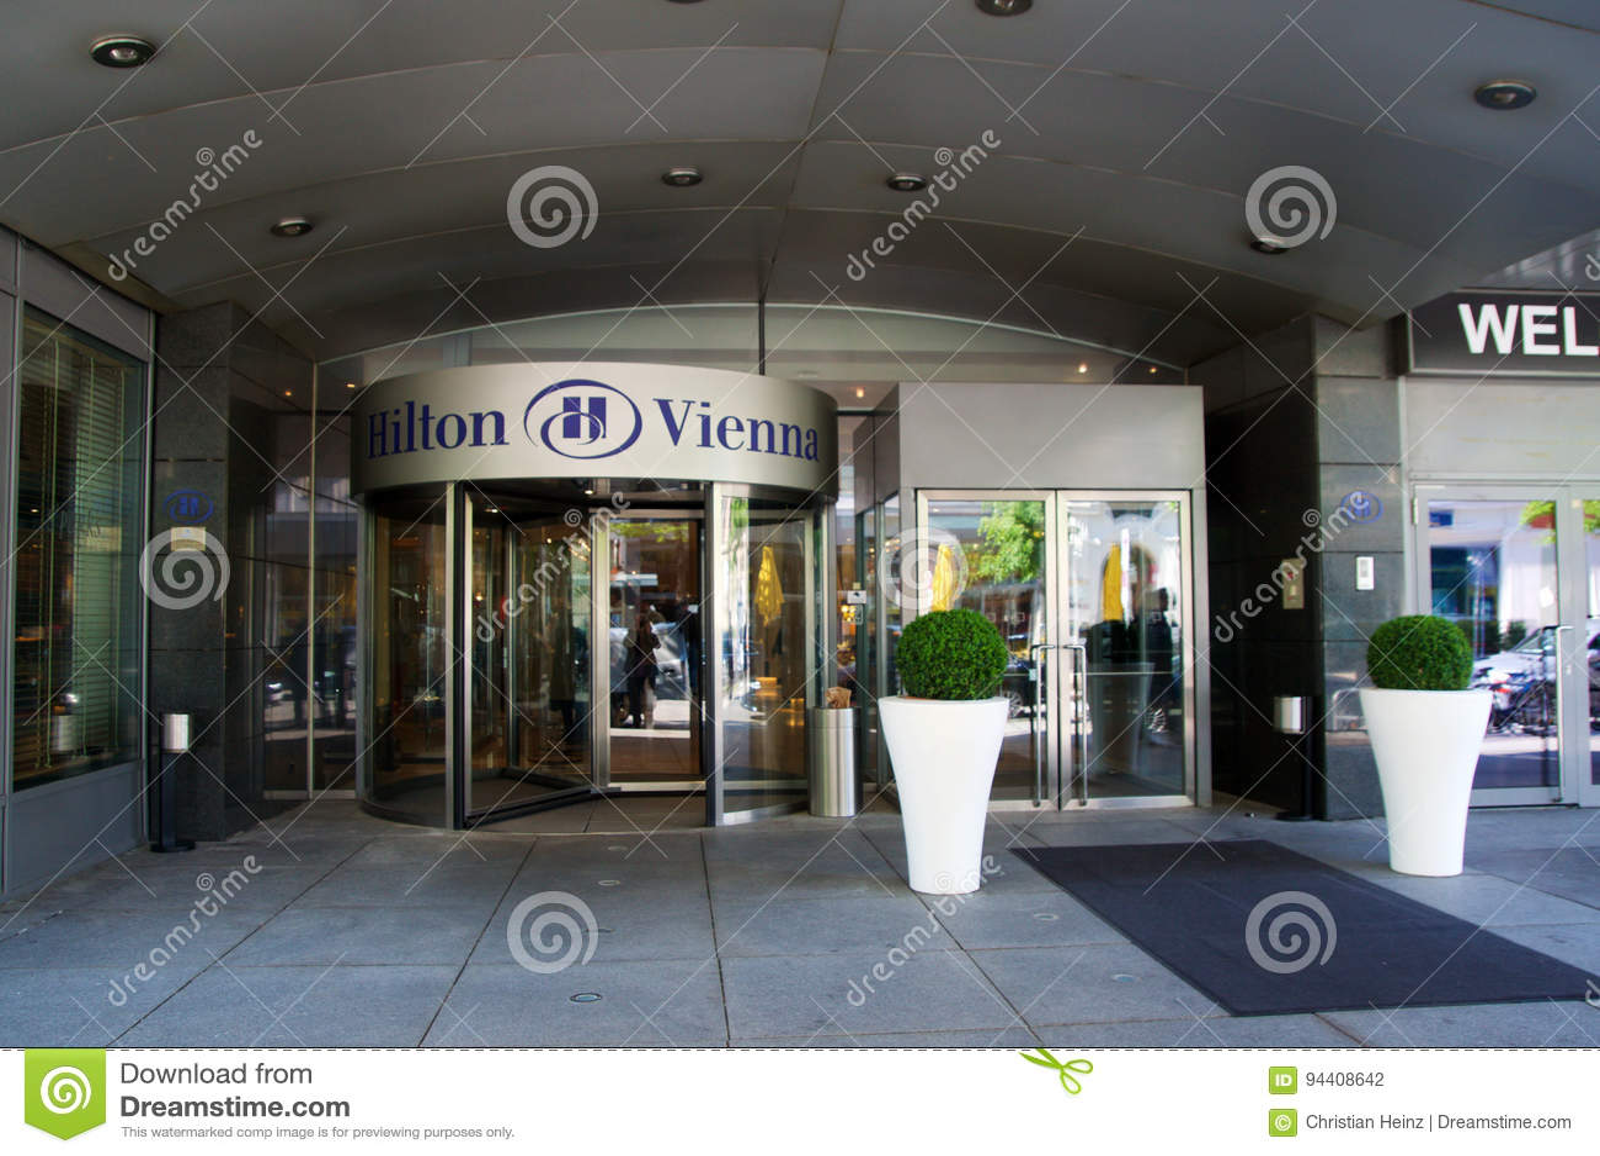 Vienna Austria Apr 30th 2017 The Logo Above The Main Entrance